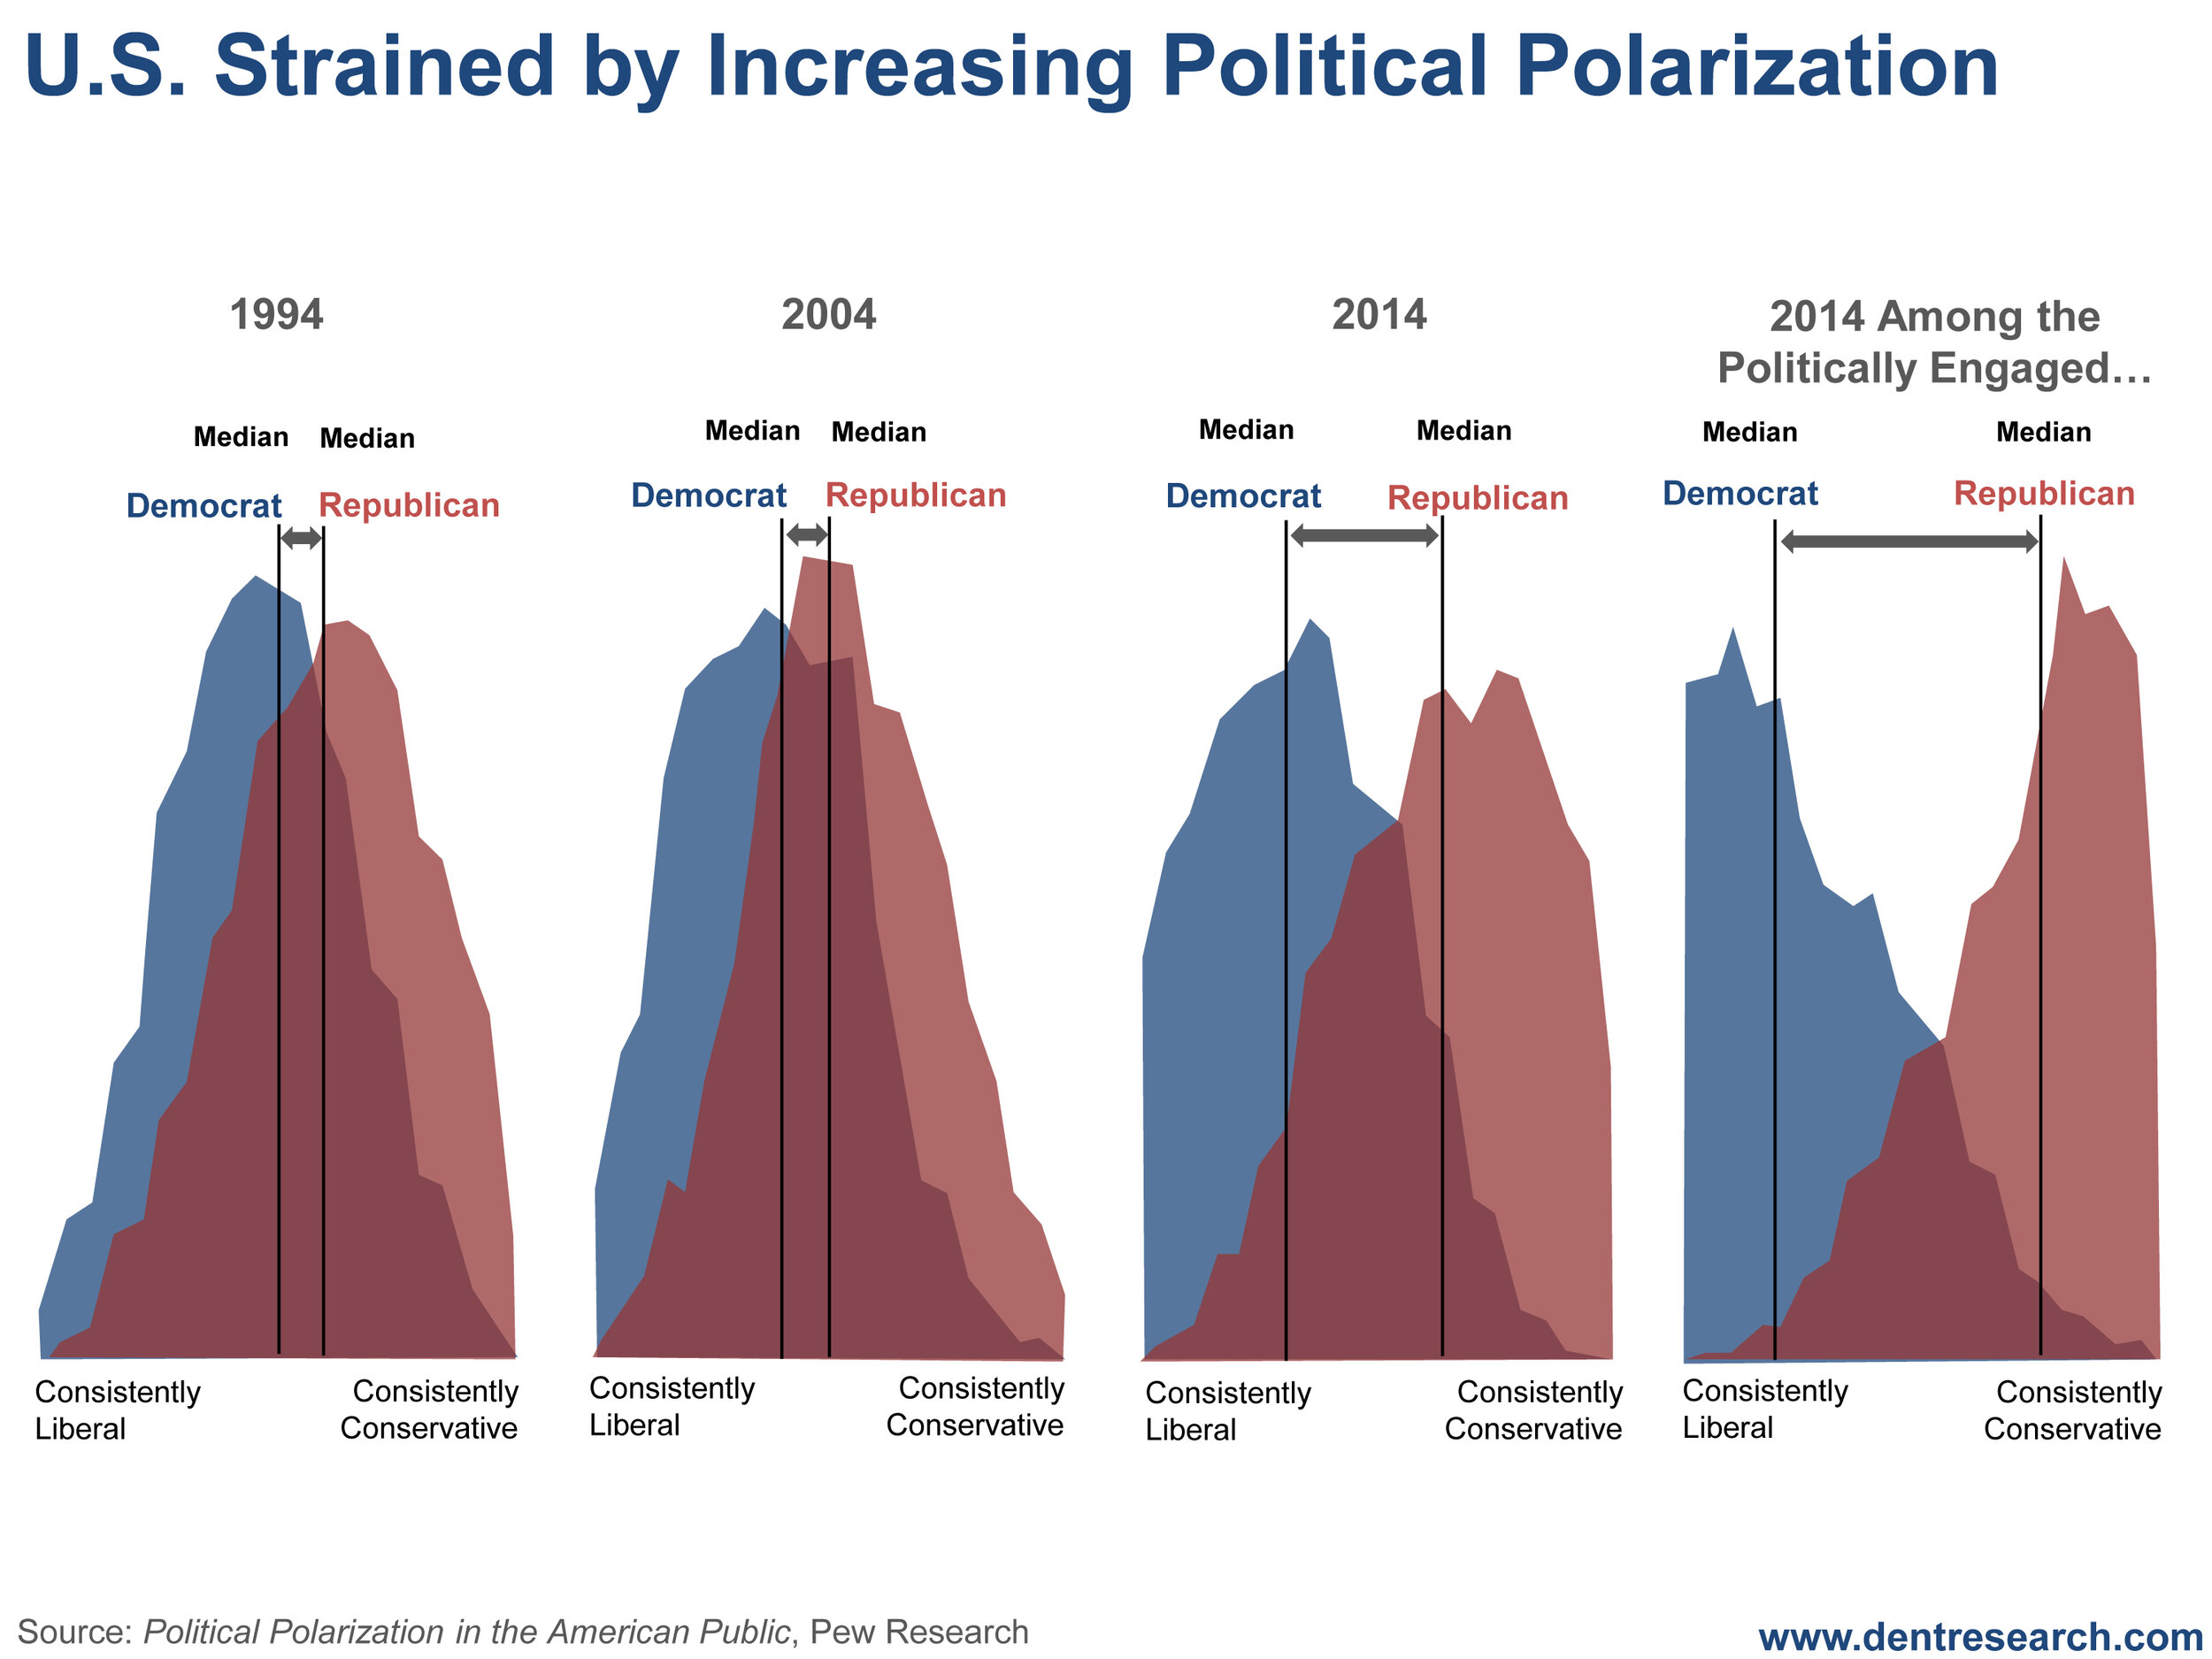 U.S.-Strained-by-Increasing-Political-Polarization.jpg